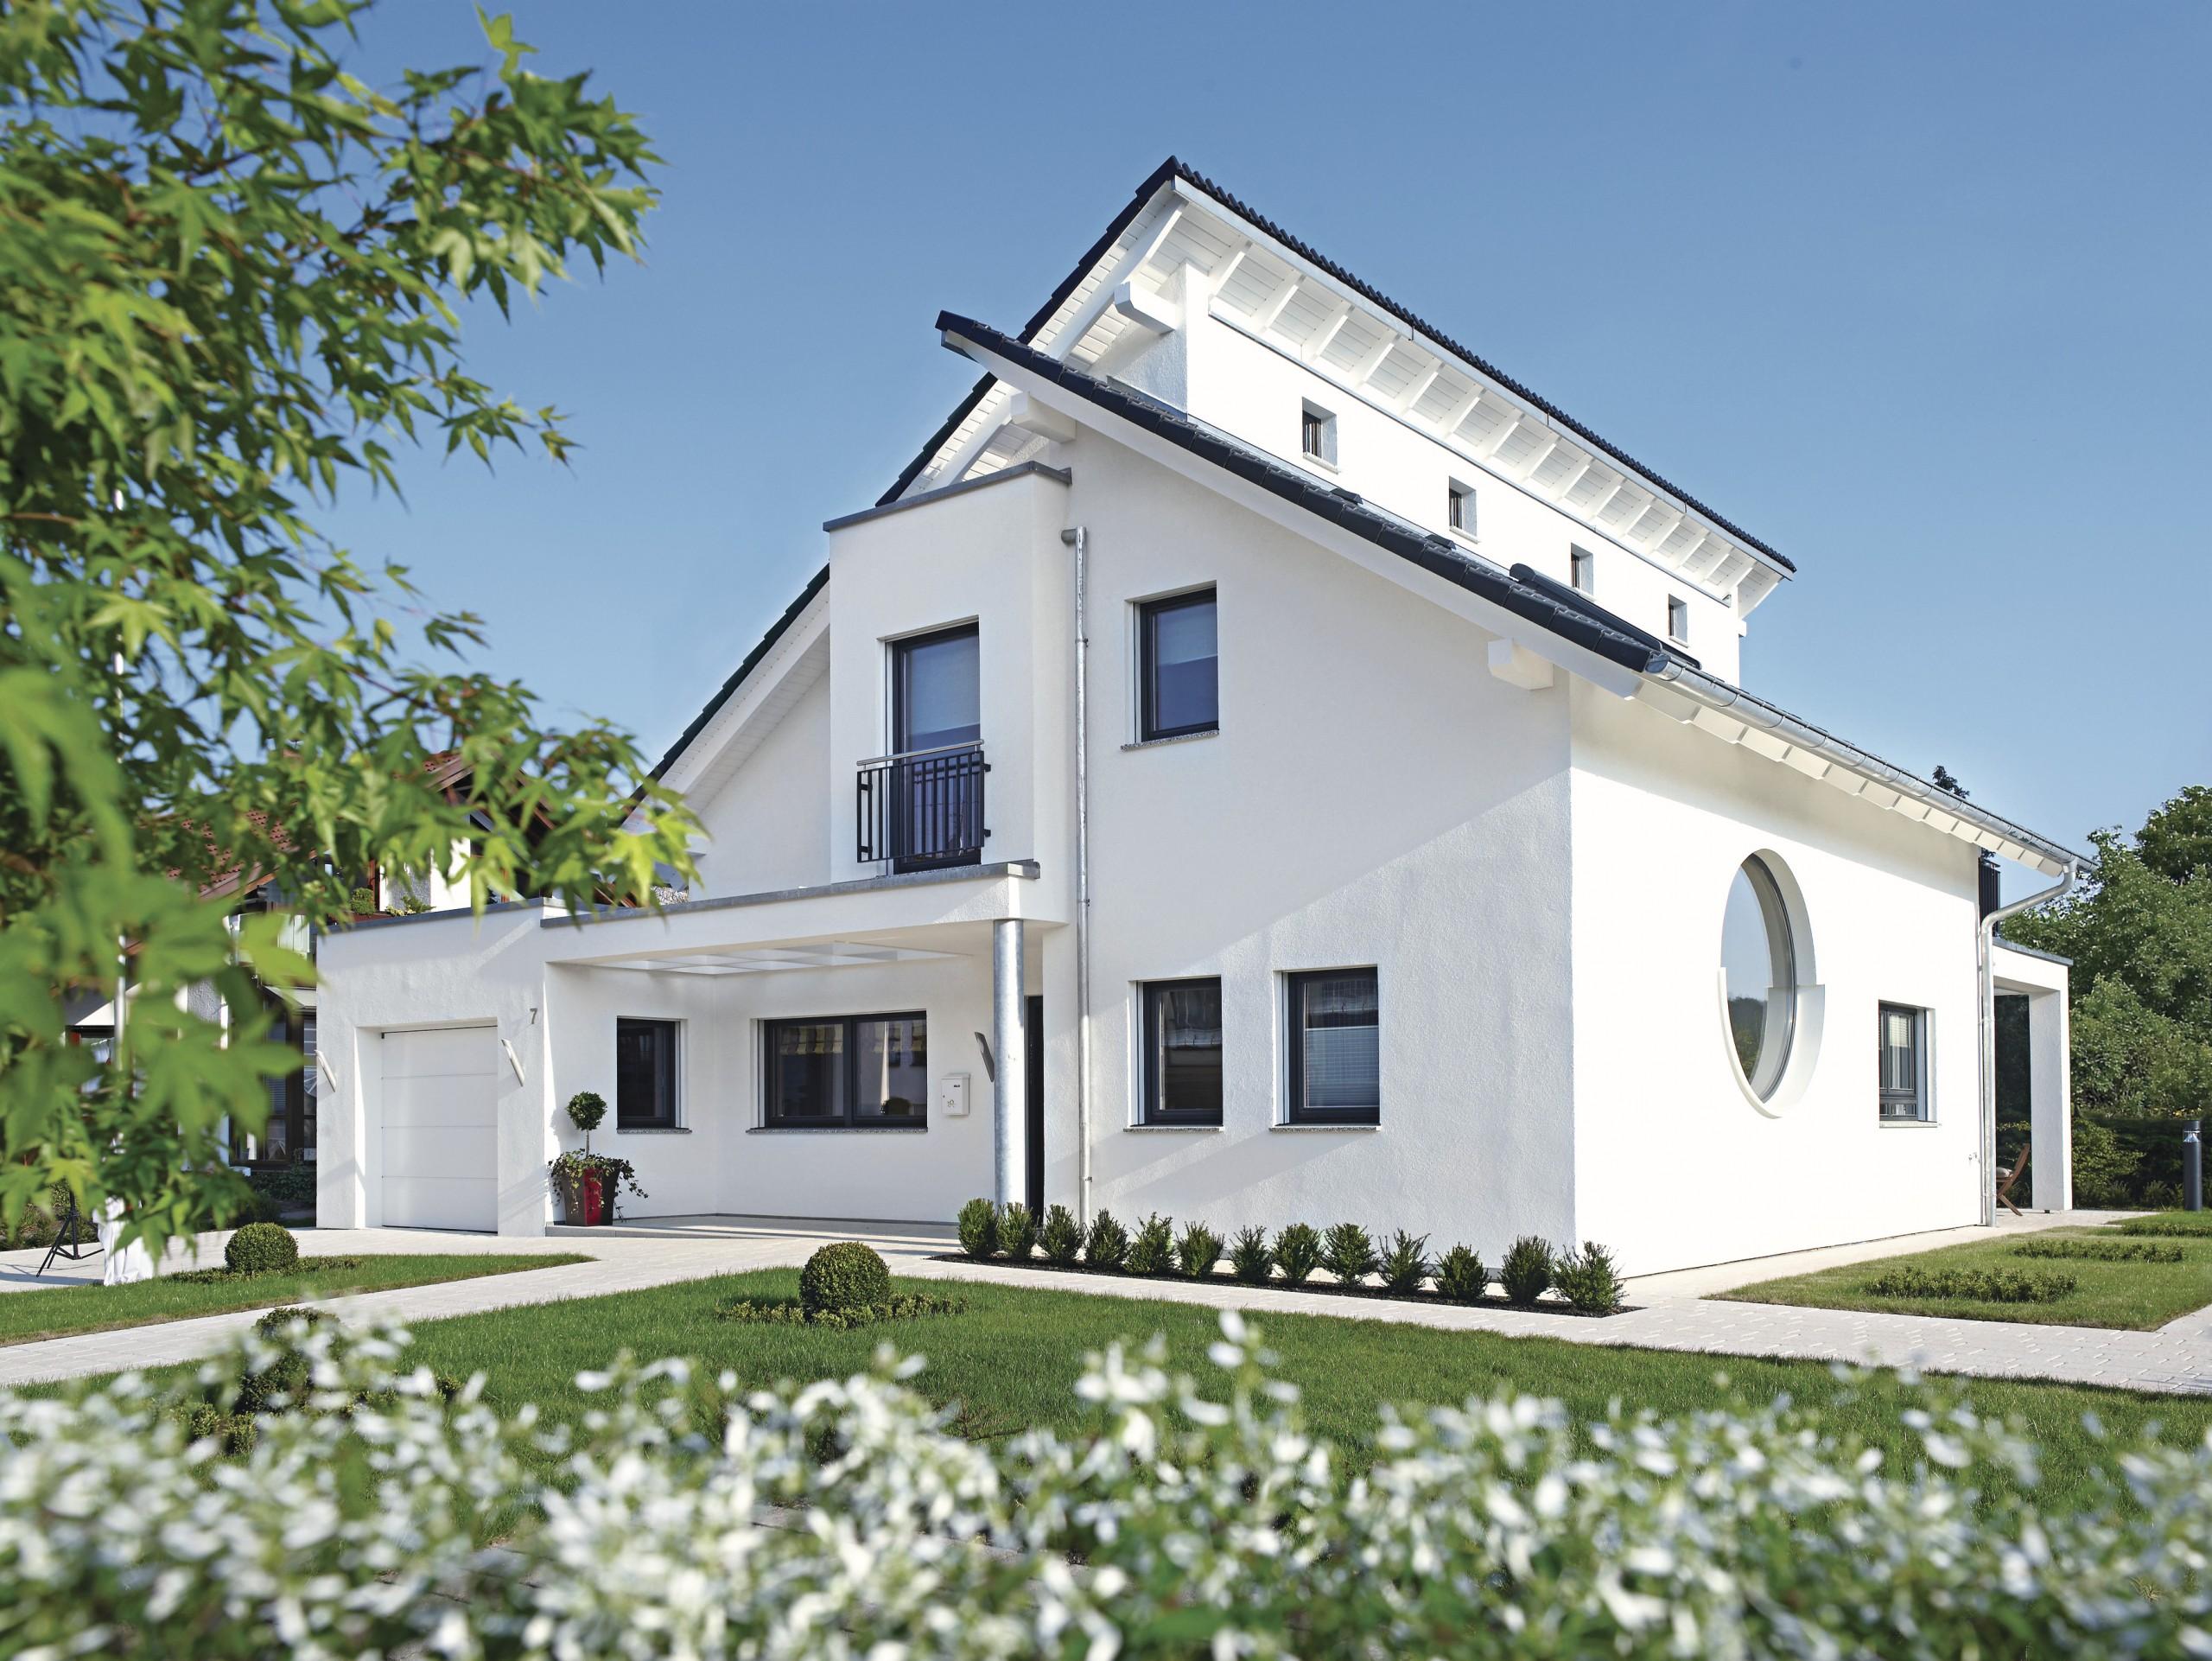 Weberhaus musterhaus wadern nunkirchen for Hausformen in deutschland